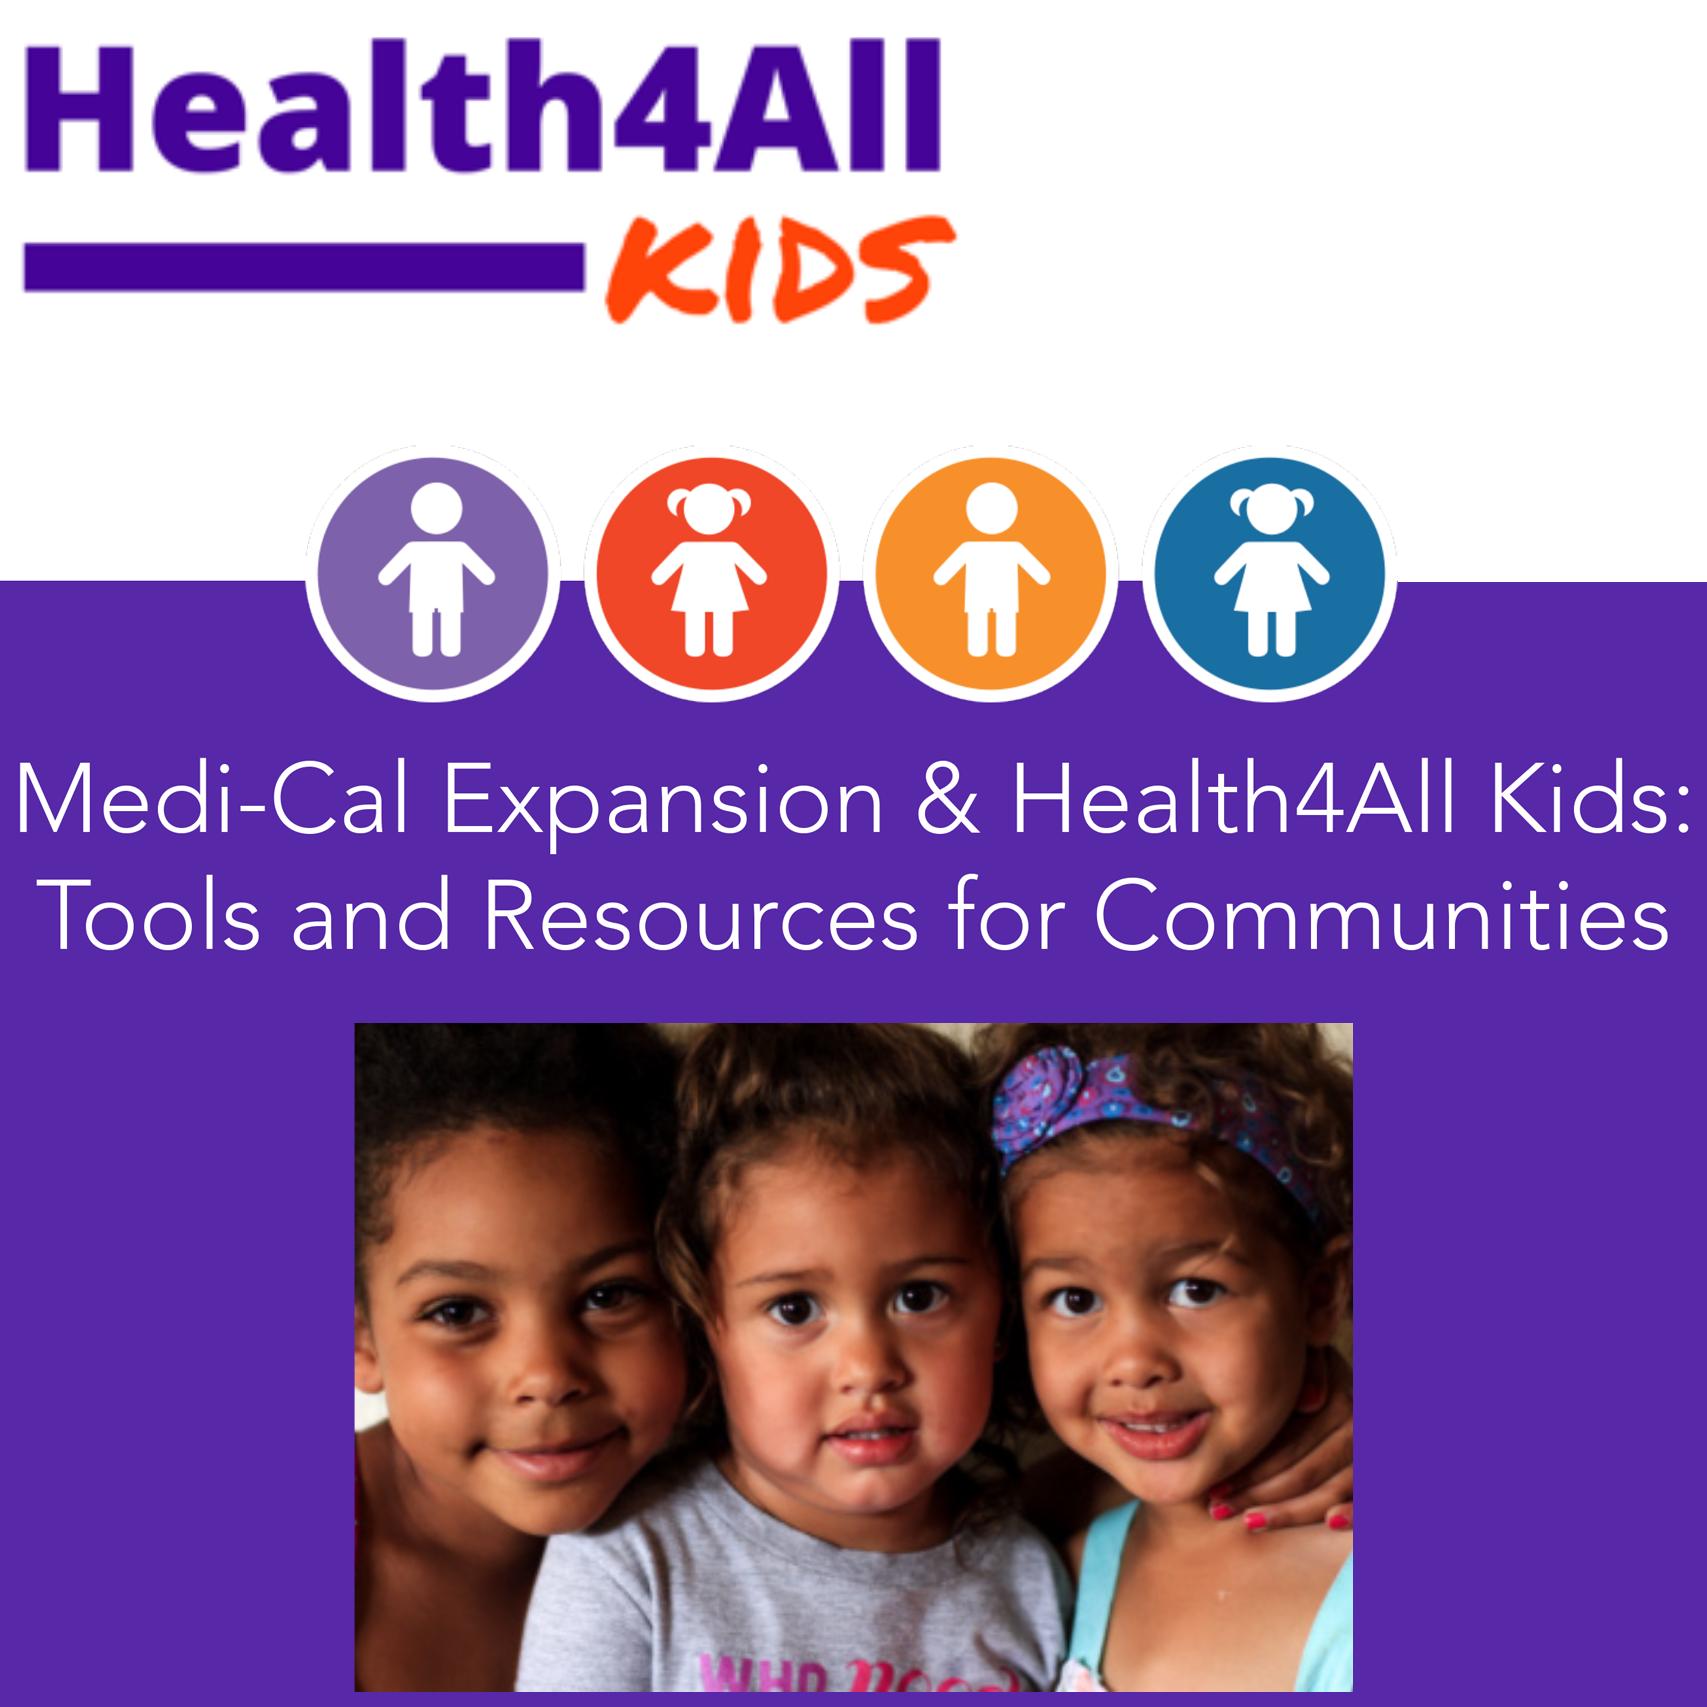 Medi-Cal Expansion & Health4All Kids